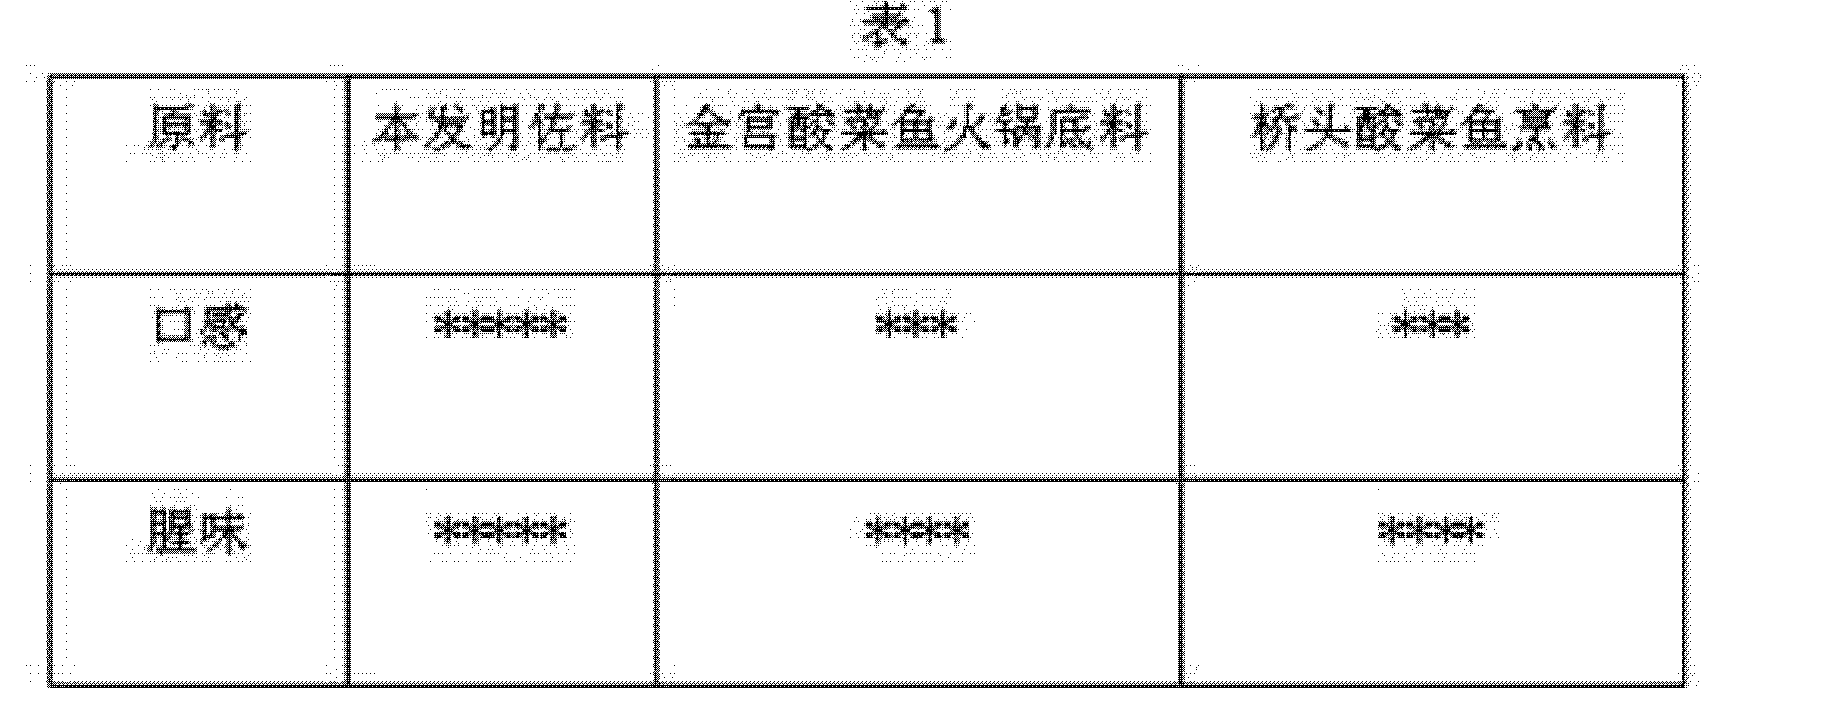 Figure CN104366405AD00061